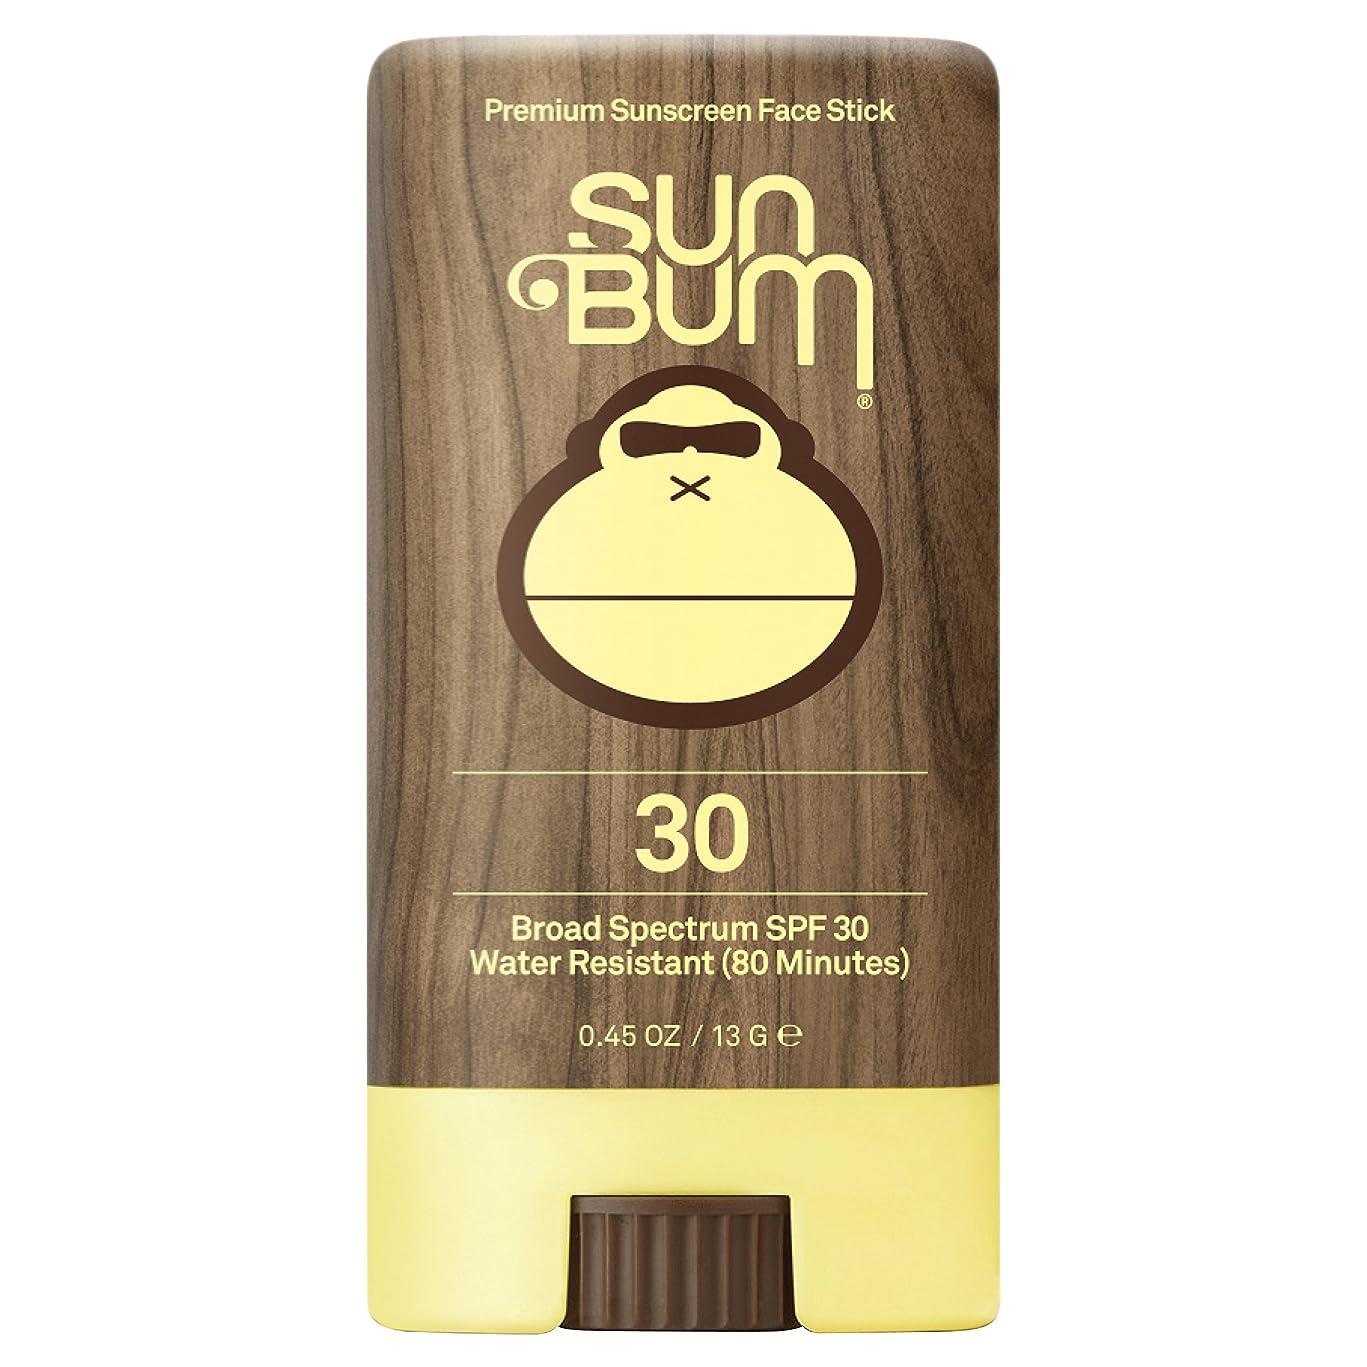 Sun Bum Premium Sunscreen Face Stick, SPF 30, 0.45 oz. Stick, 1 Count, Broad Spectrum UVA/UVB Protection, Paraben Free, Gluten Free, Oil Free